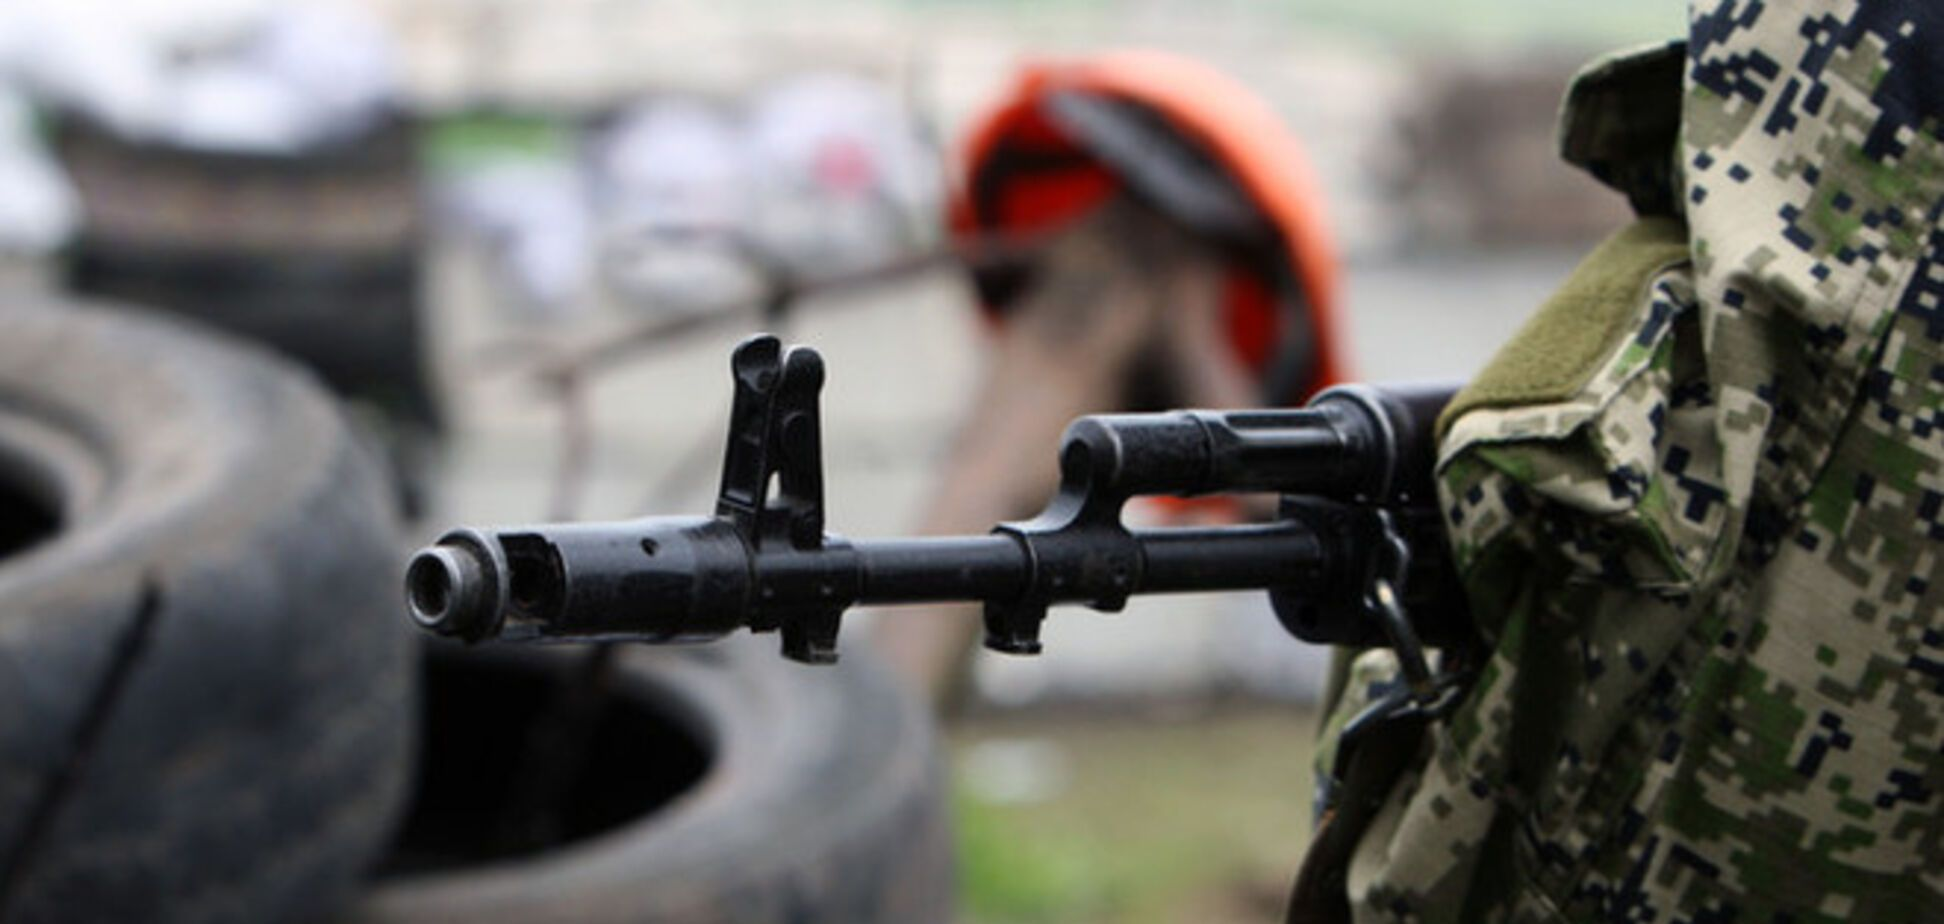 Несмотря на остановку огня силовиками, террористы напали на силы АТО